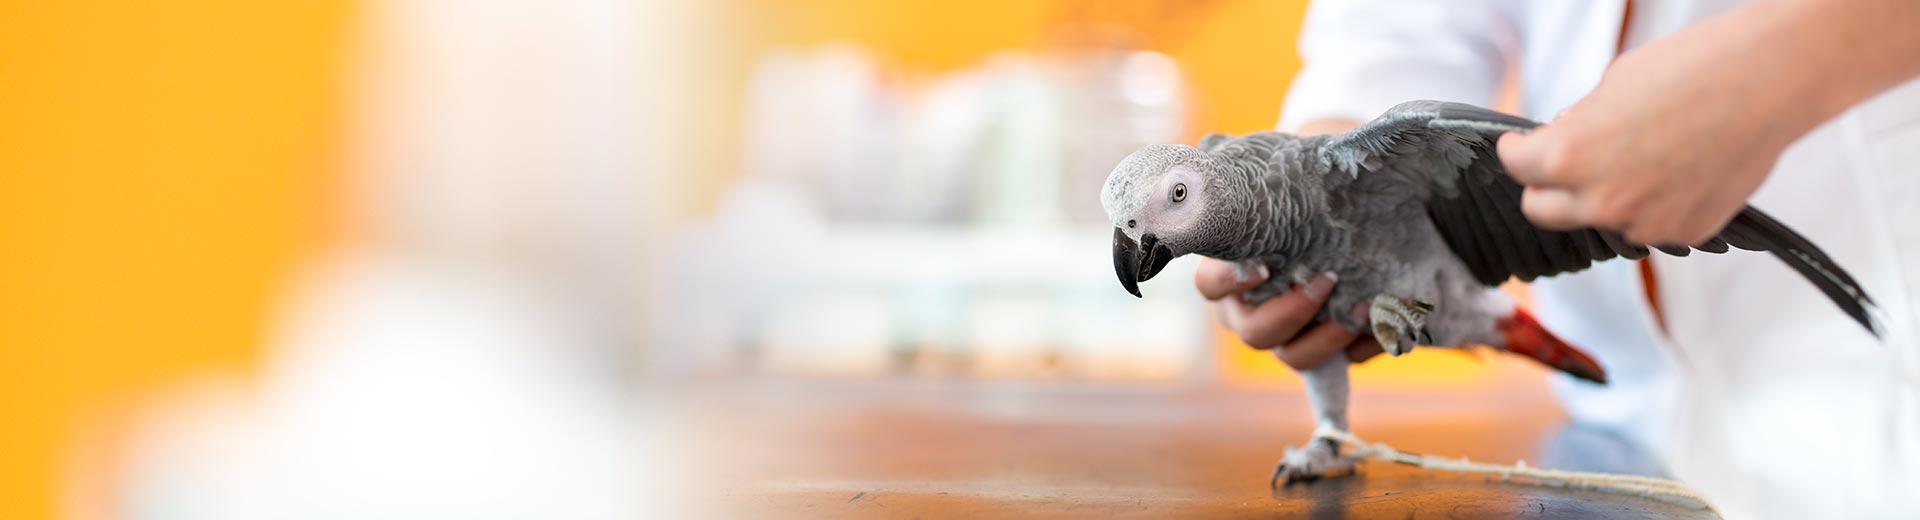 Vogels - papegaai